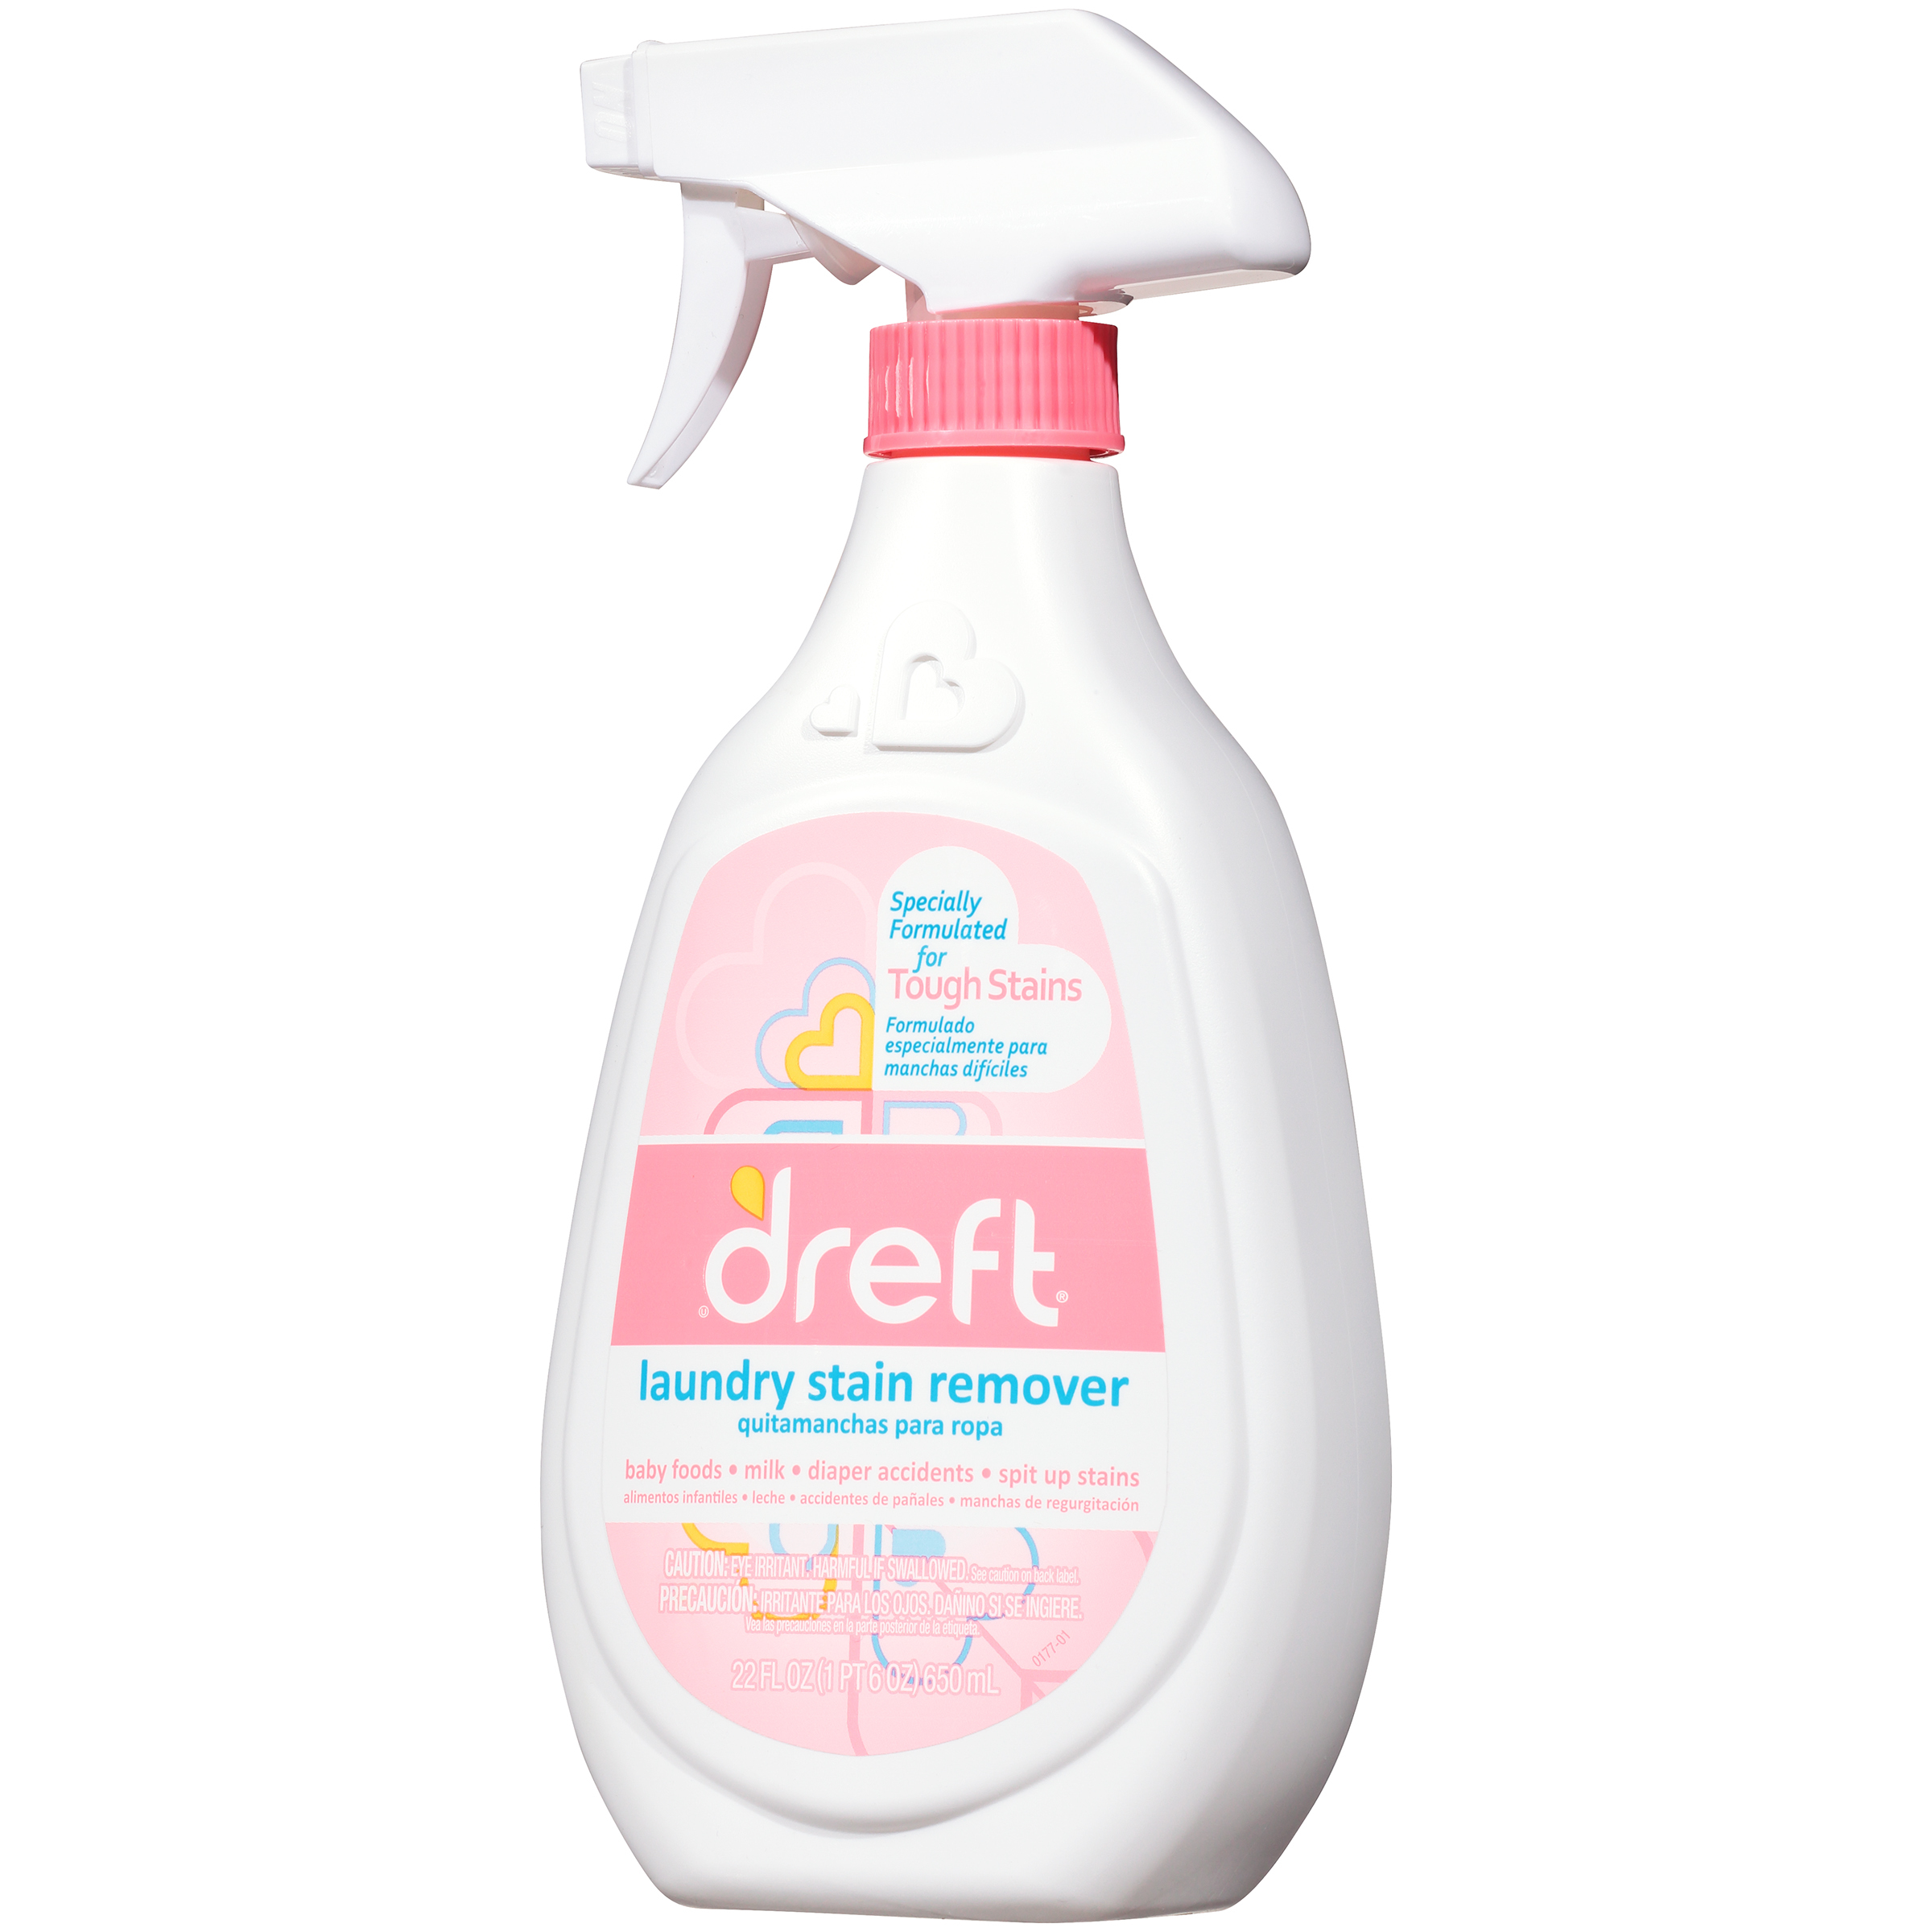 Dreft Laundry Stain Remover 22 Oz Walmart